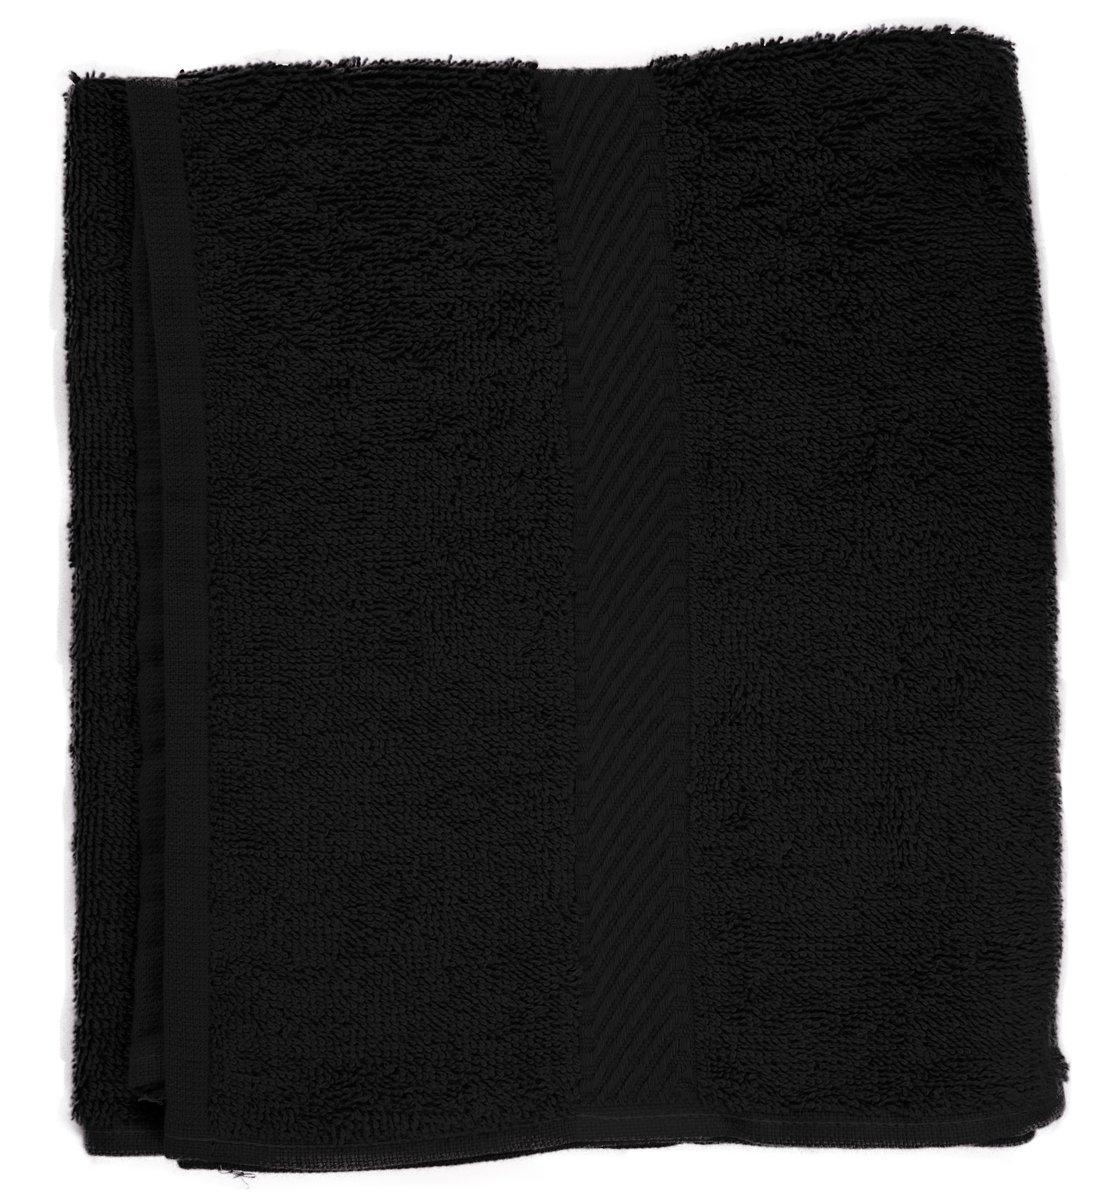 color negro Fripac-Medis 30 x 90 cm Toalla para la cabeza